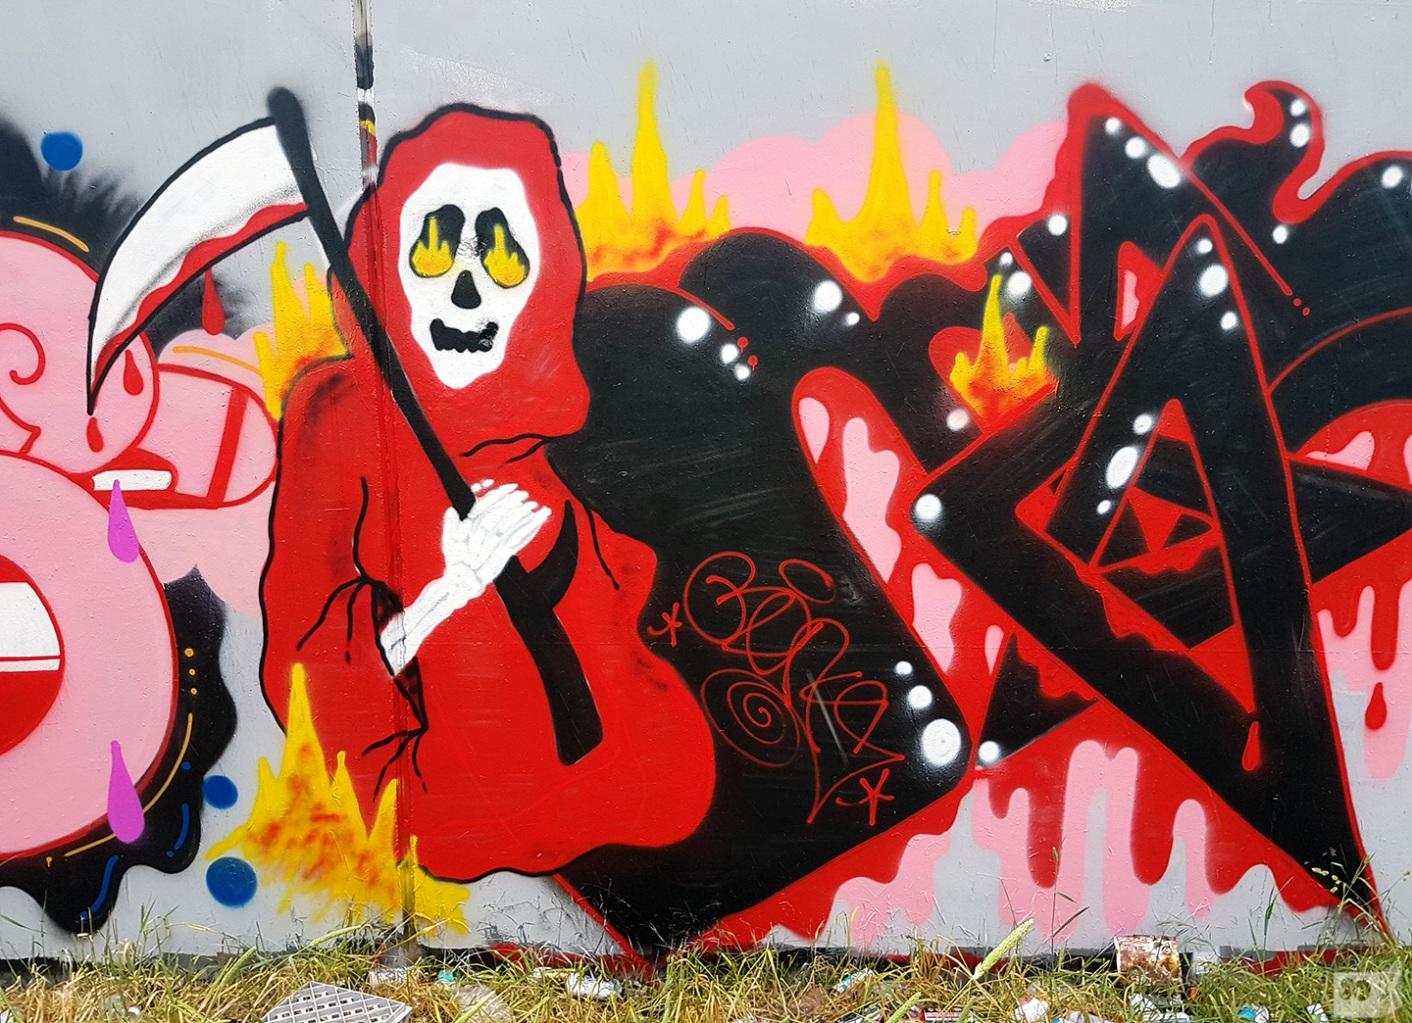 the-fourth-walls-melbourne-graffiti-pawk-icee-lazee-smut-kawps-renks-tragic-sage-tres-preston6